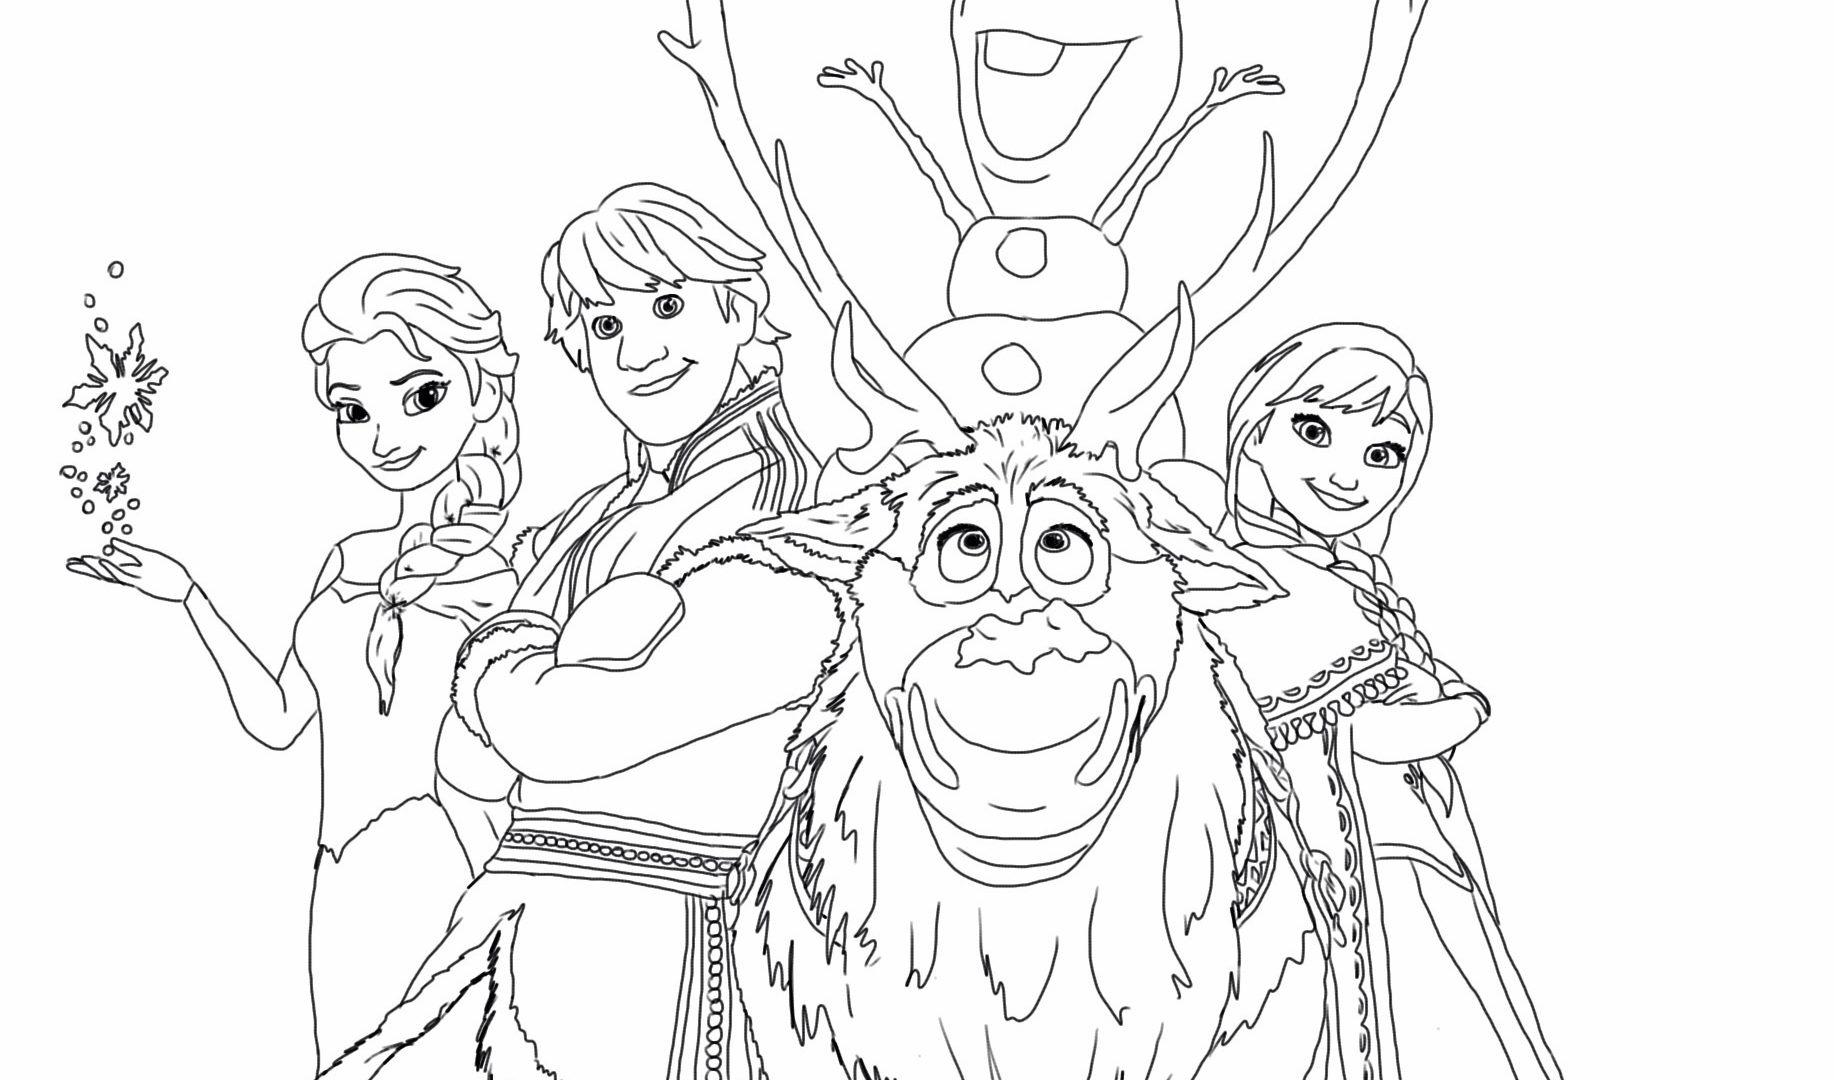 Coloring Ideas : Printable Frozen Coloring Pages O Olaf Ideas Cool - Free Printable Coloring Pages Disney Frozen